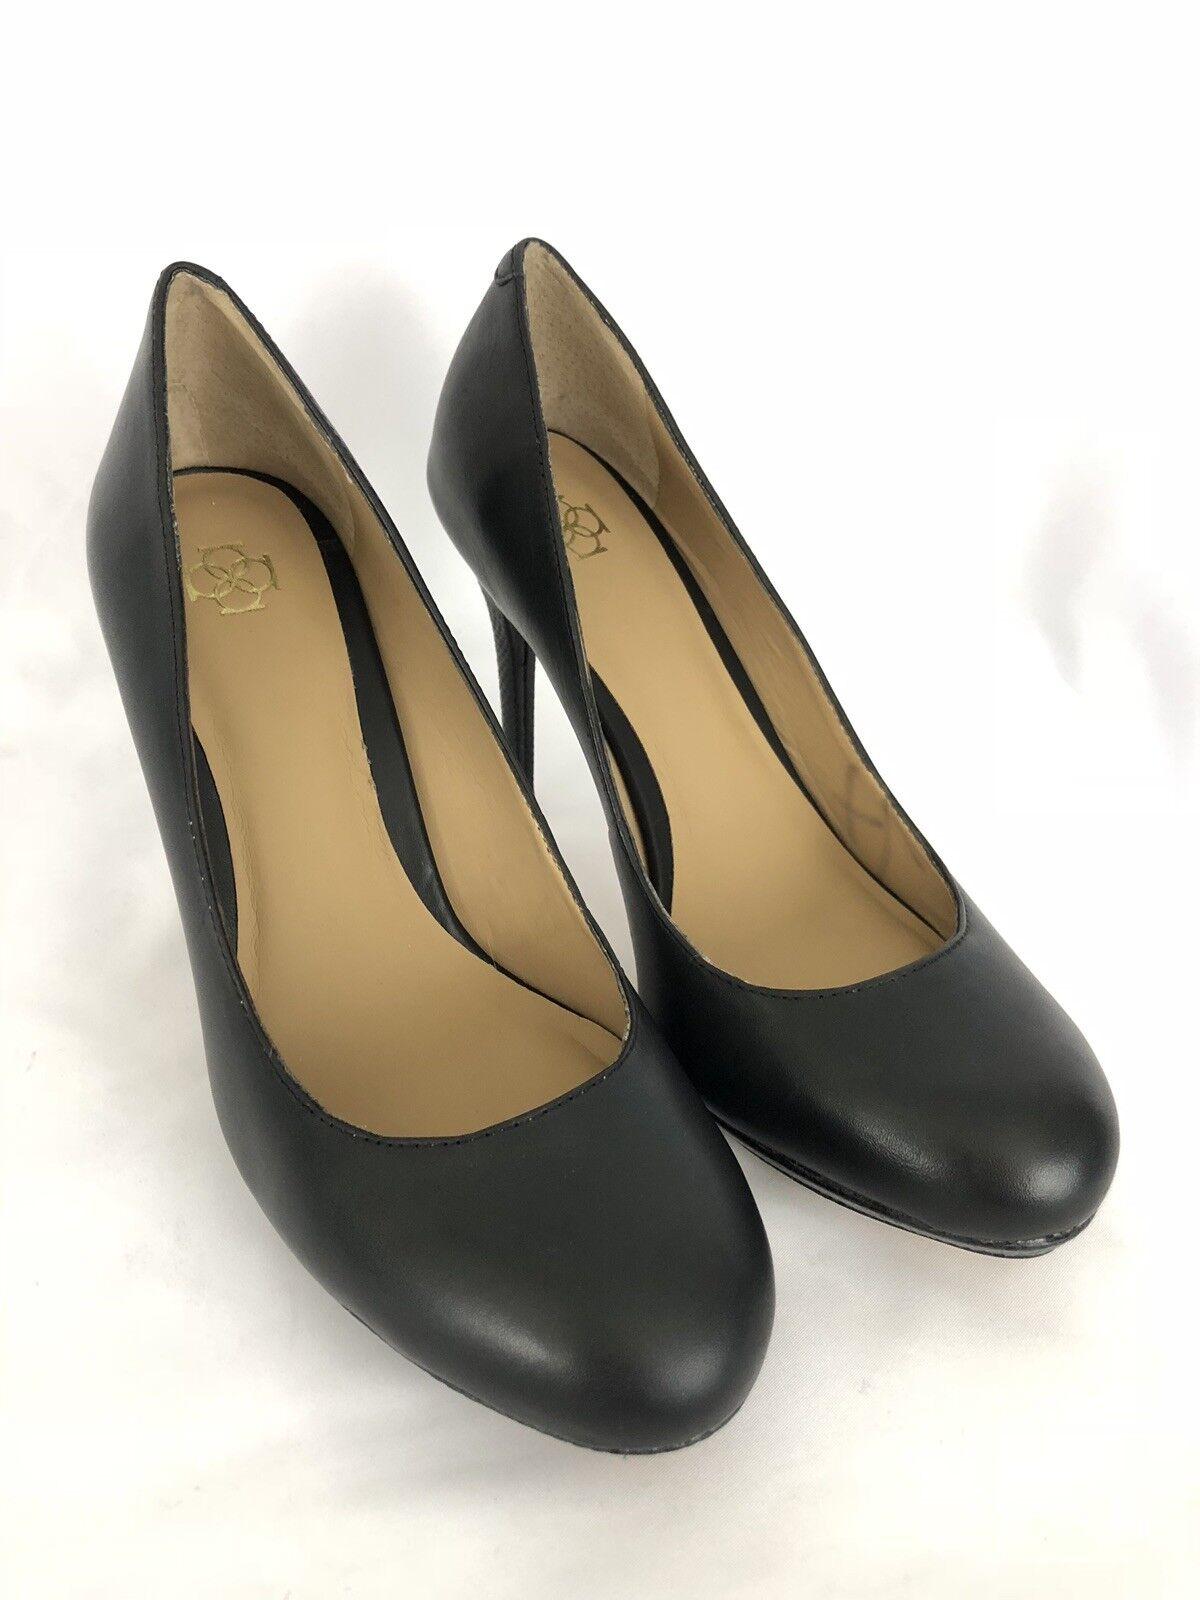 Ann Taylor Womens Leather Black High Heel Pumps with Platform Size 7 M EUC SH293